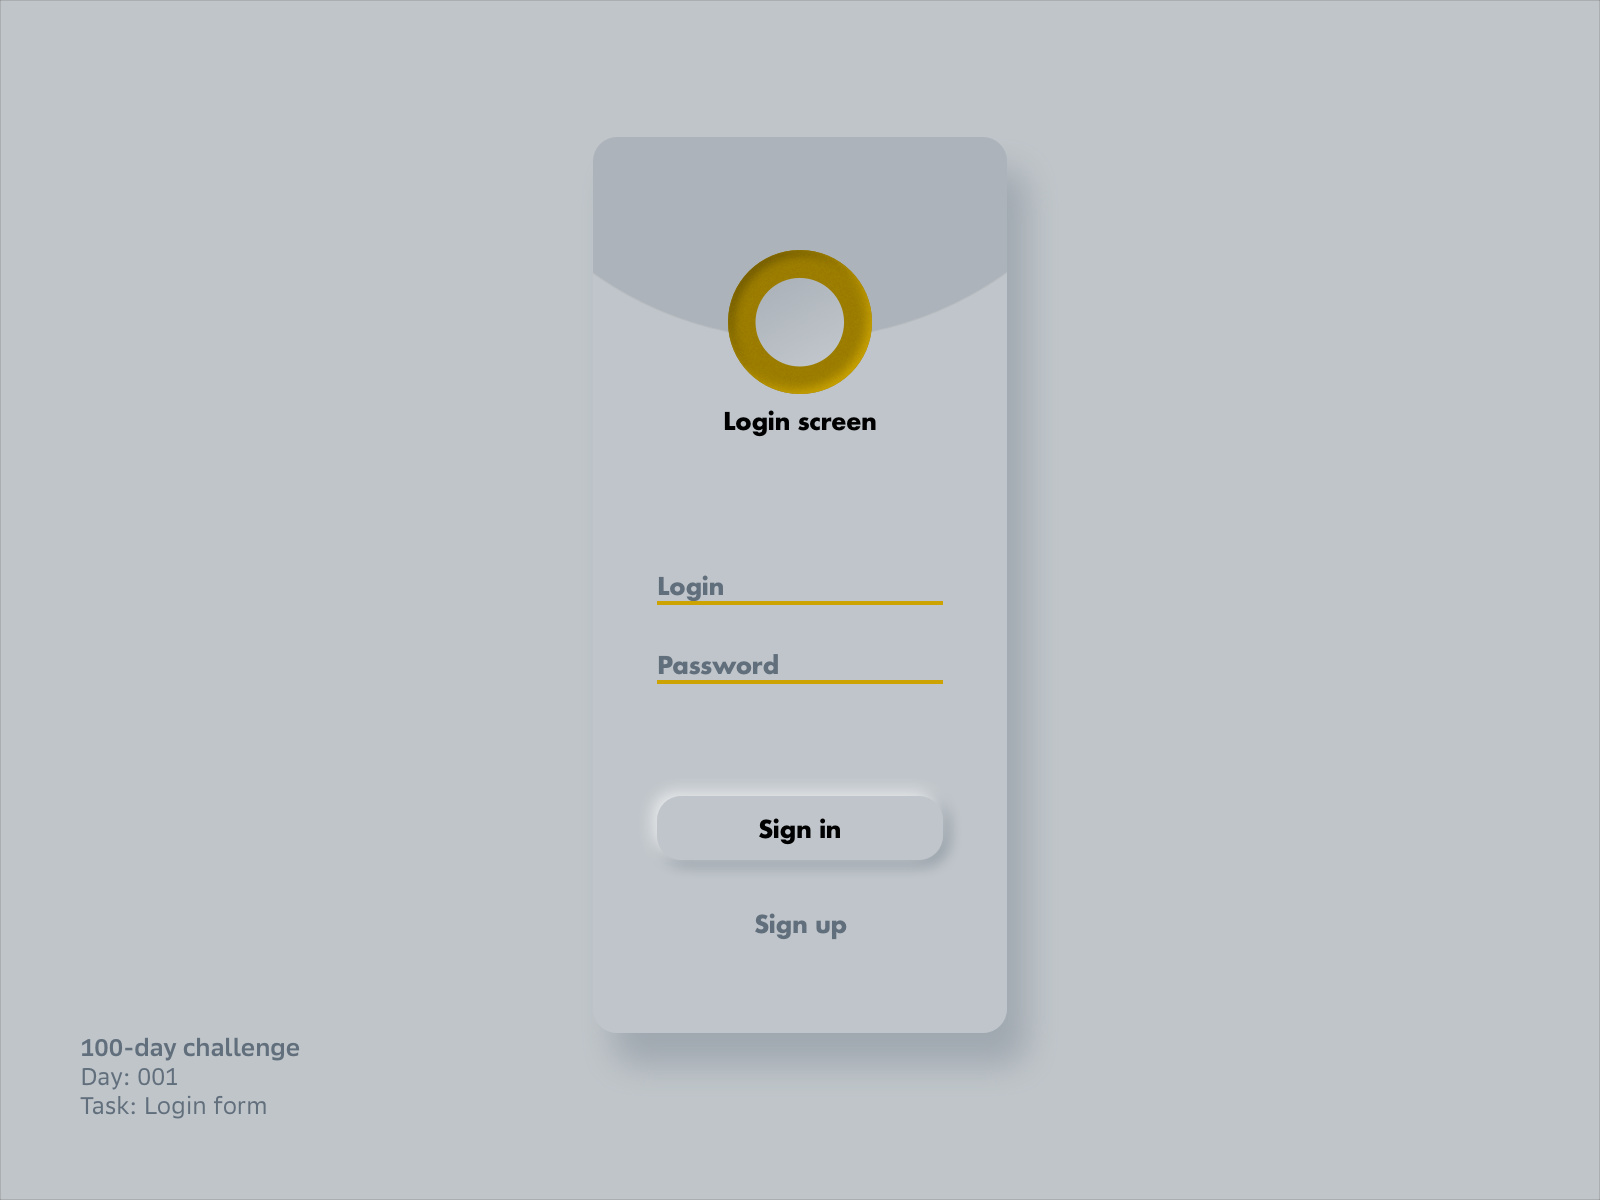 001 - Login form #DailyUI cover image